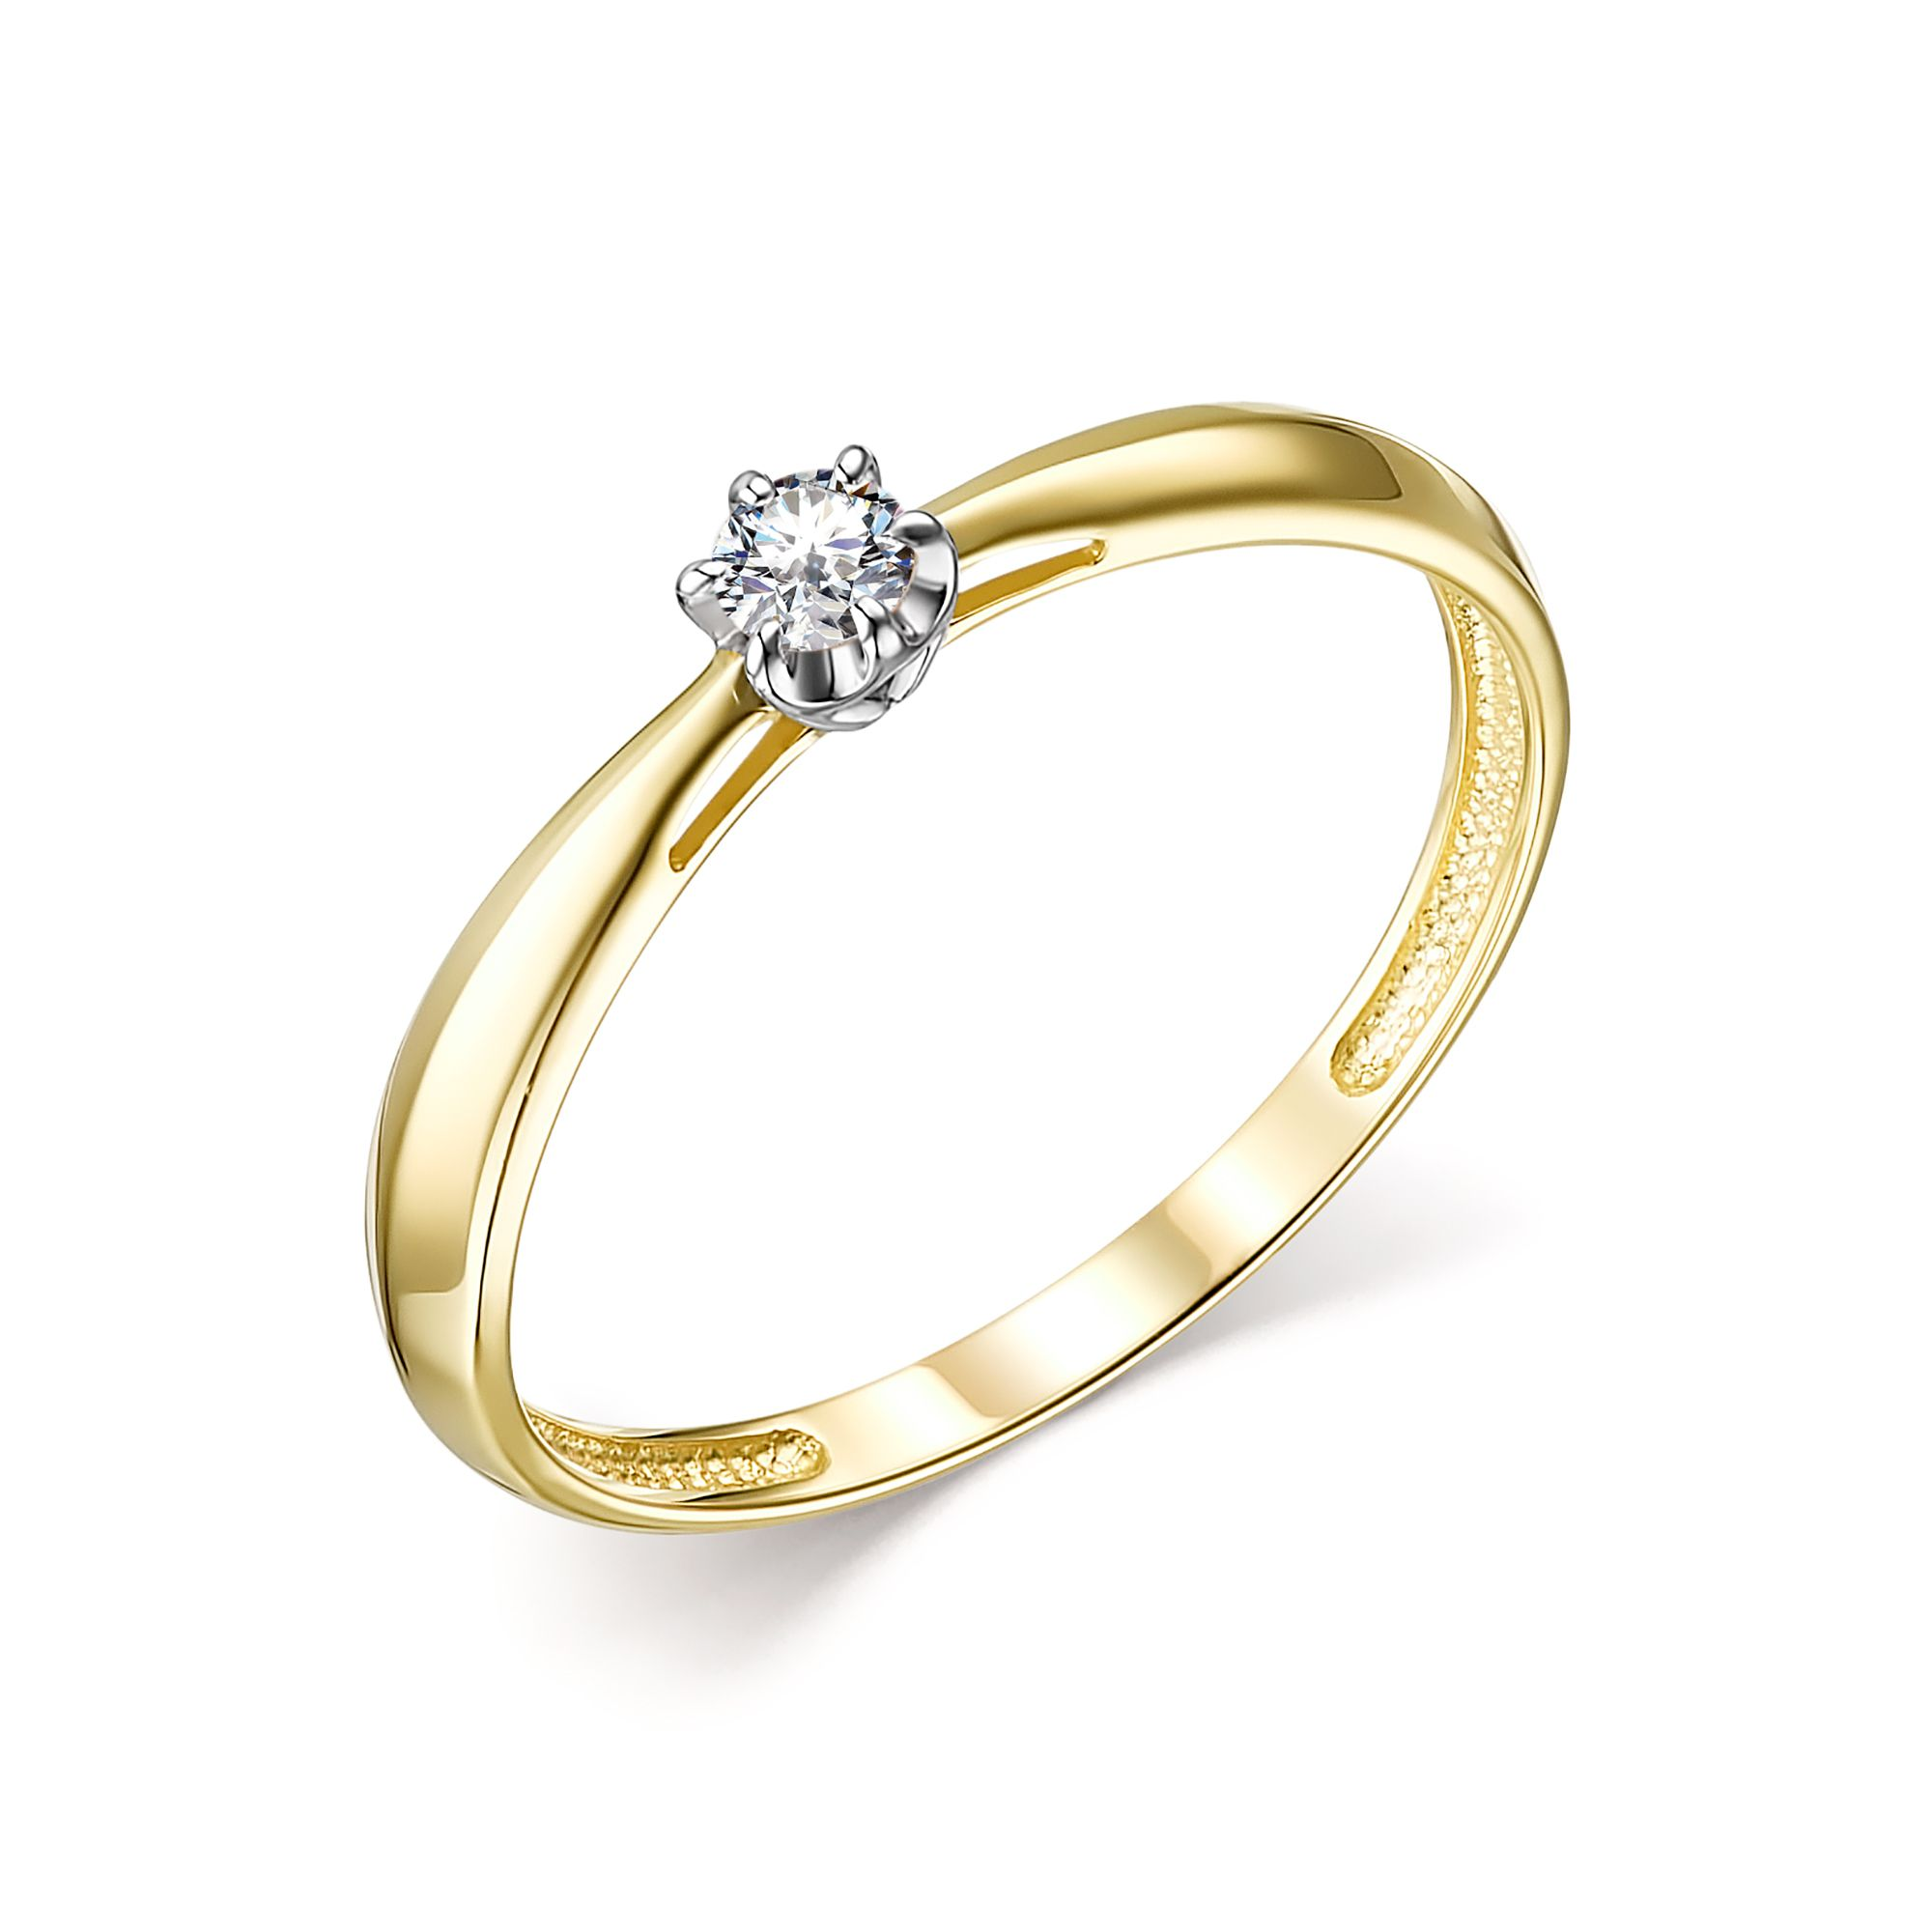 картинка кольцо 13823-300 1 бриллиант круг 57 0,091 10-15 4/6а 13823-300